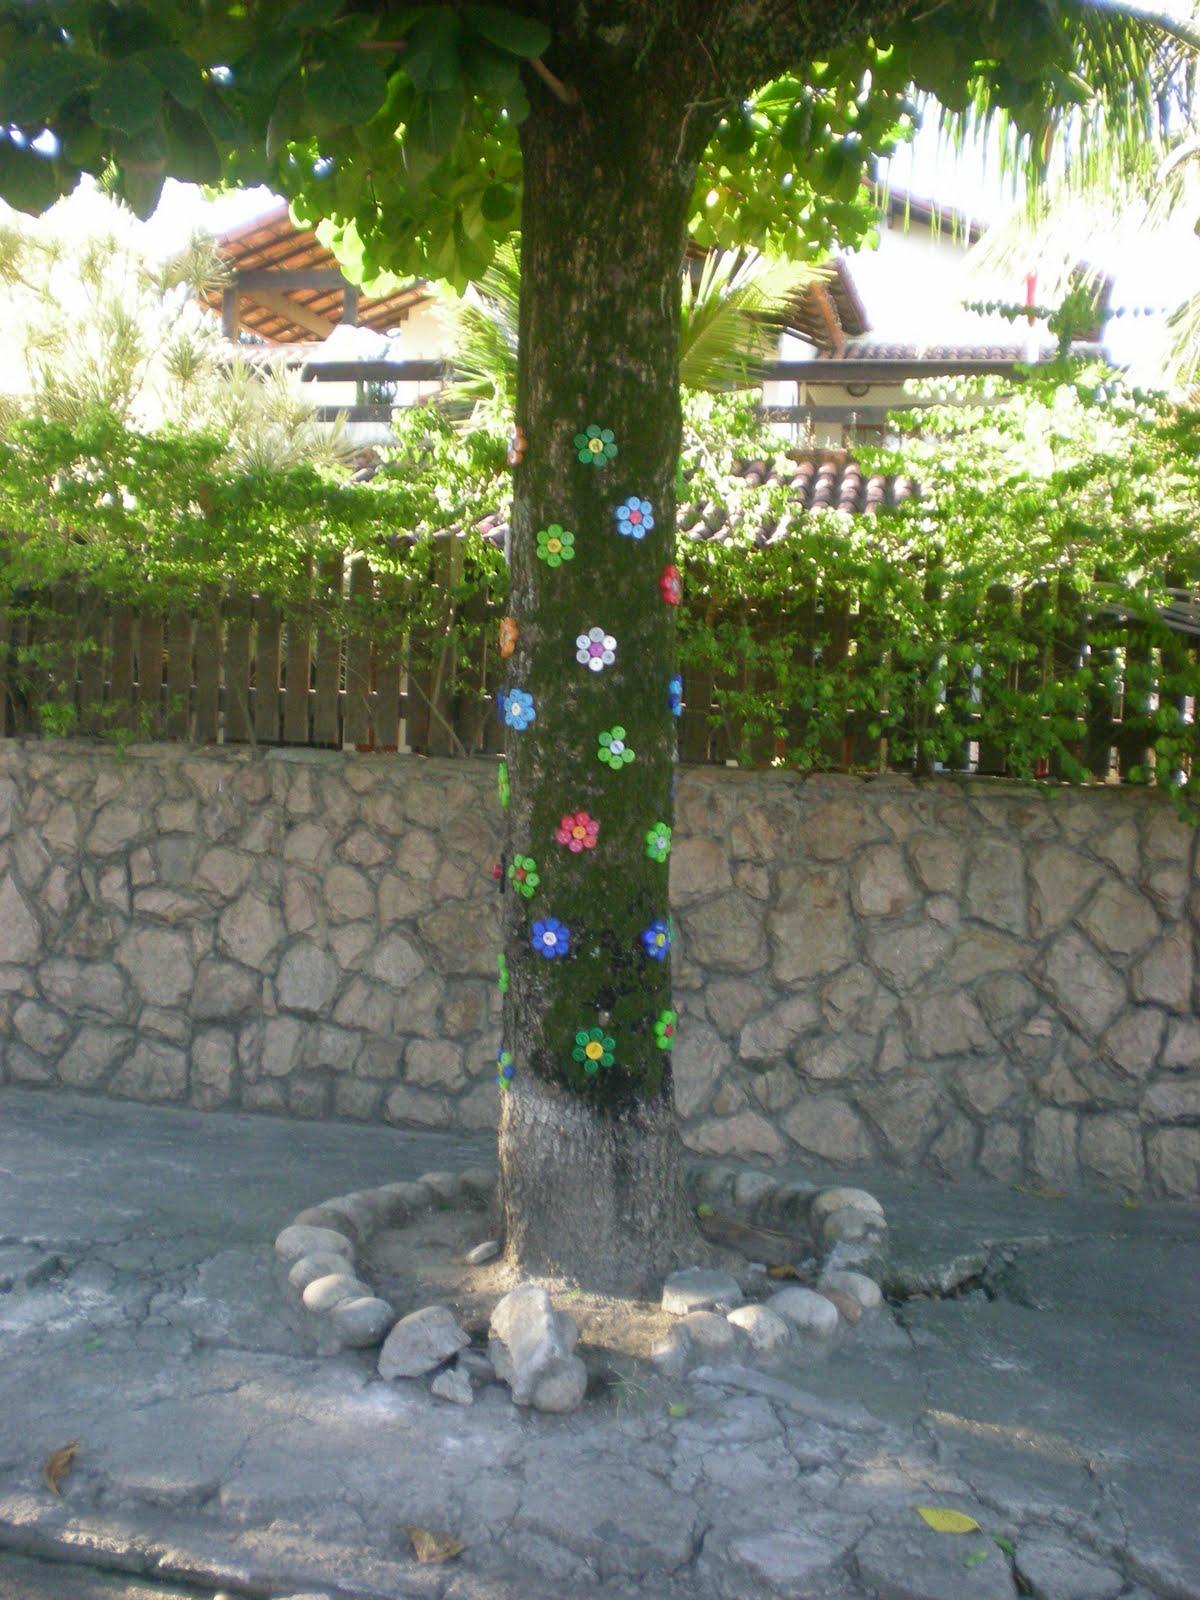 de garrafa pet coloridas que fizeram formato de flores muito legal